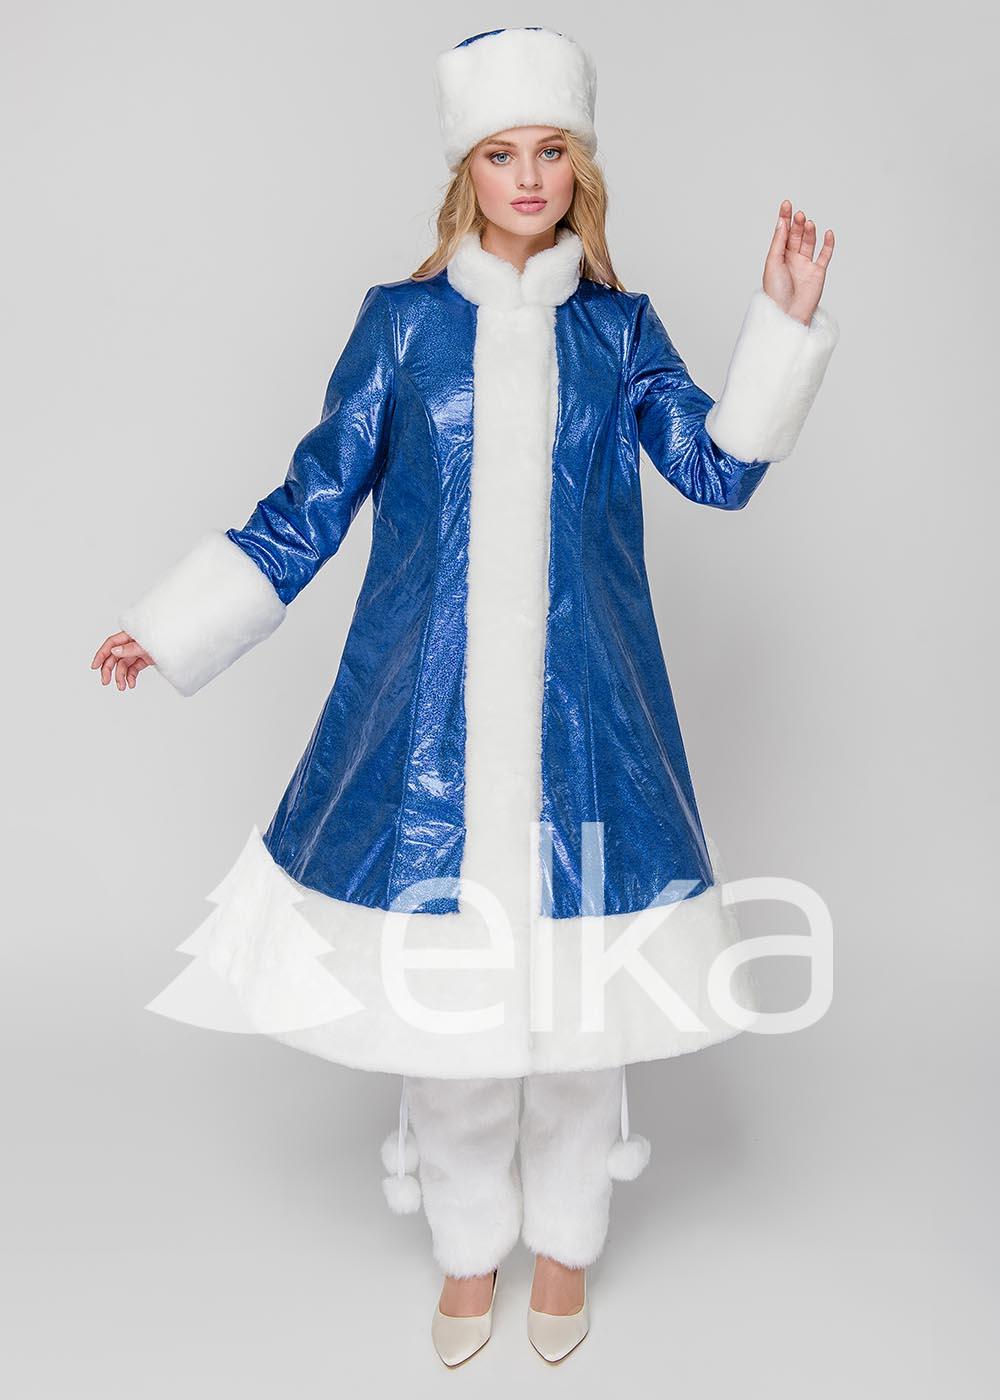 Костюм Снегурочки Стелла синяя